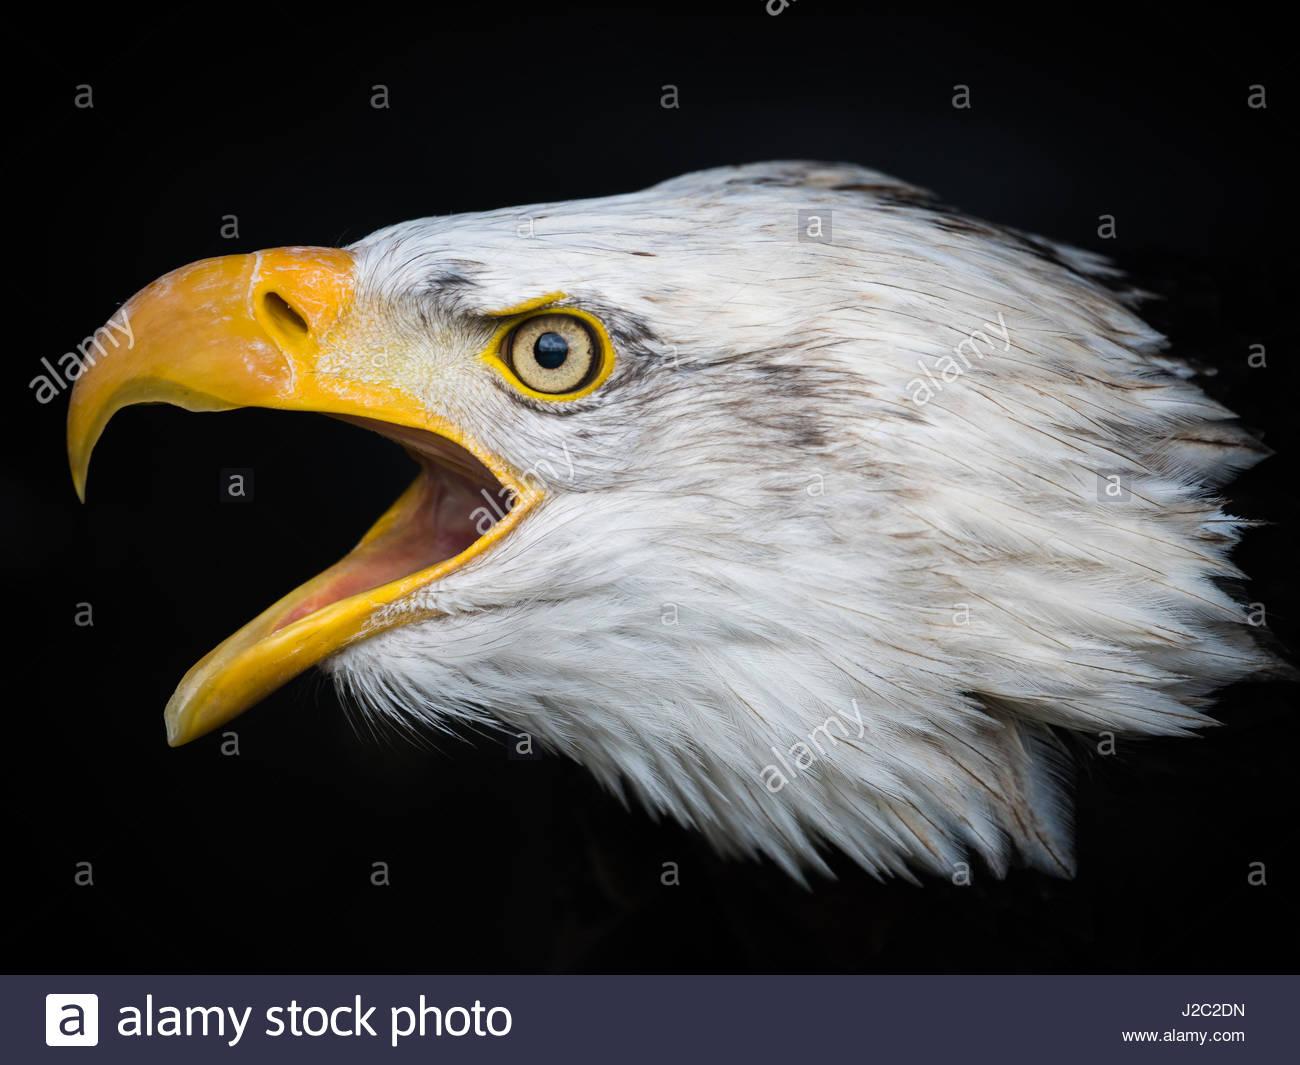 Eagle beak - photo#48